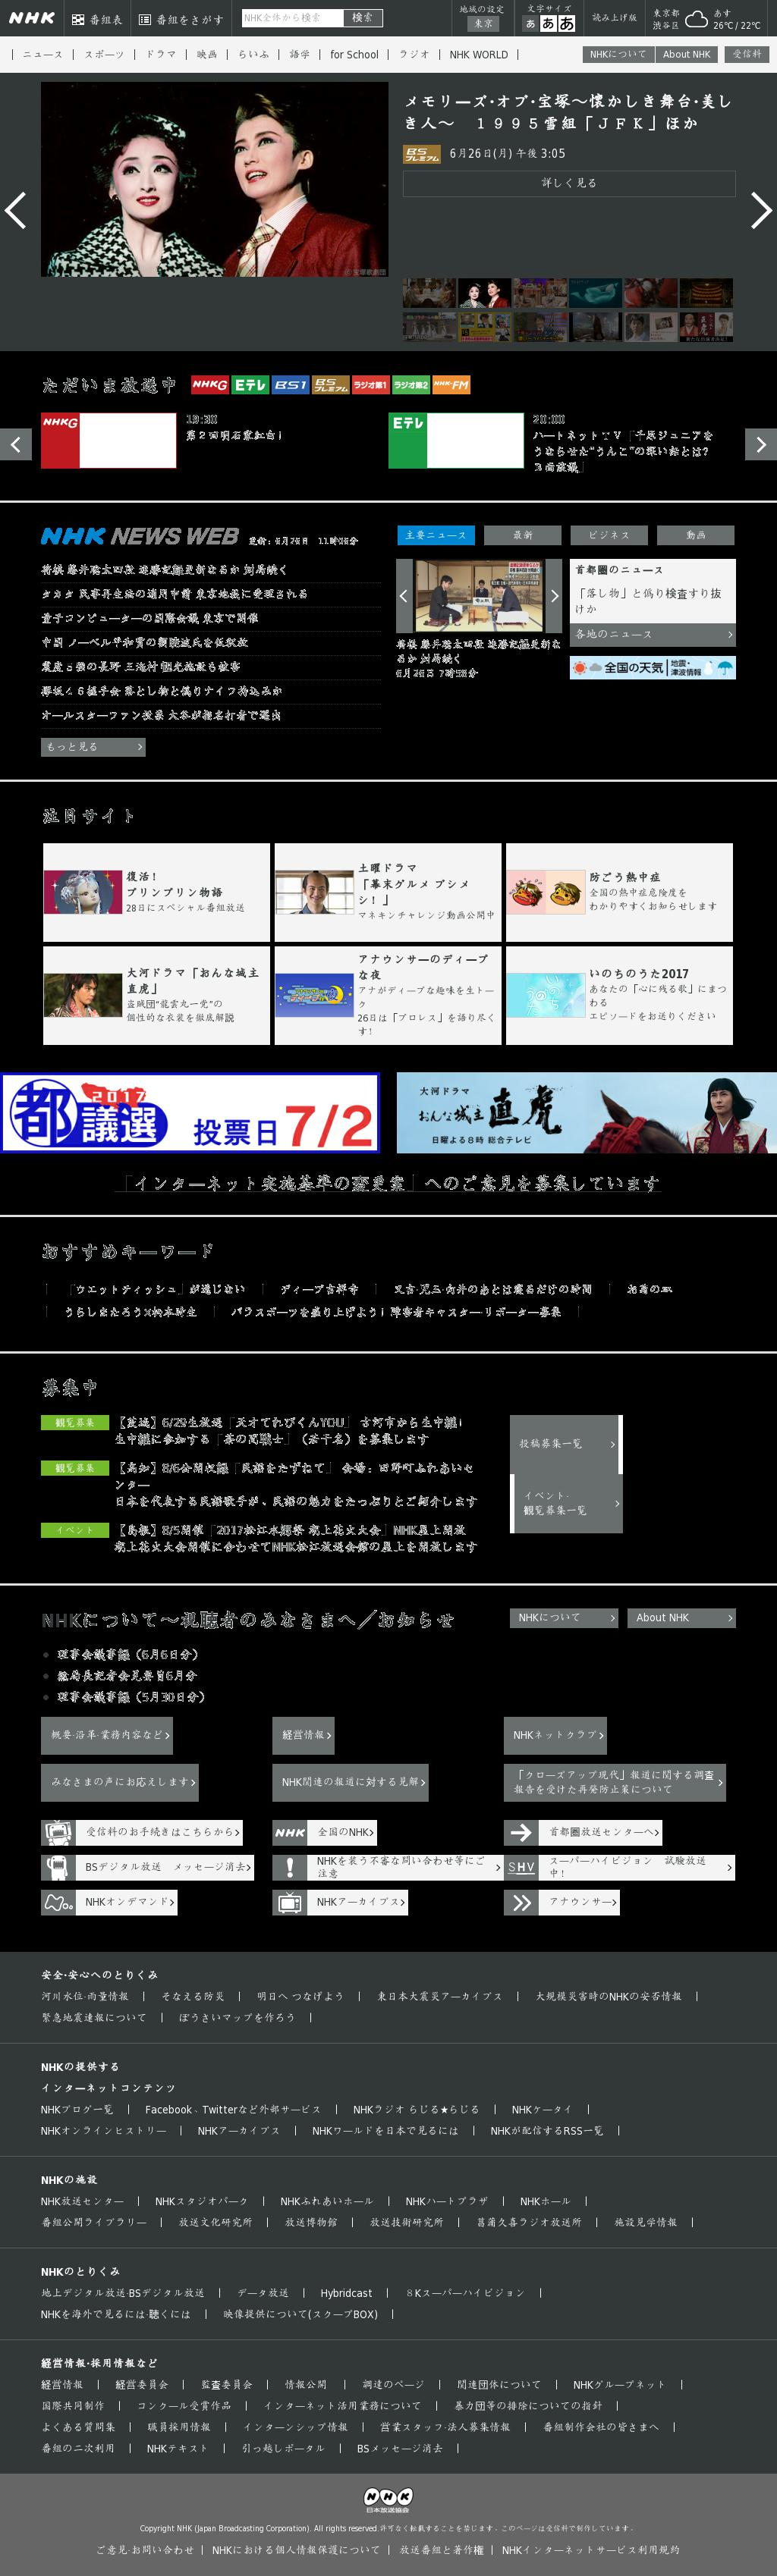 NHK Online at Monday June 26, 2017, 11:14 a.m. UTC